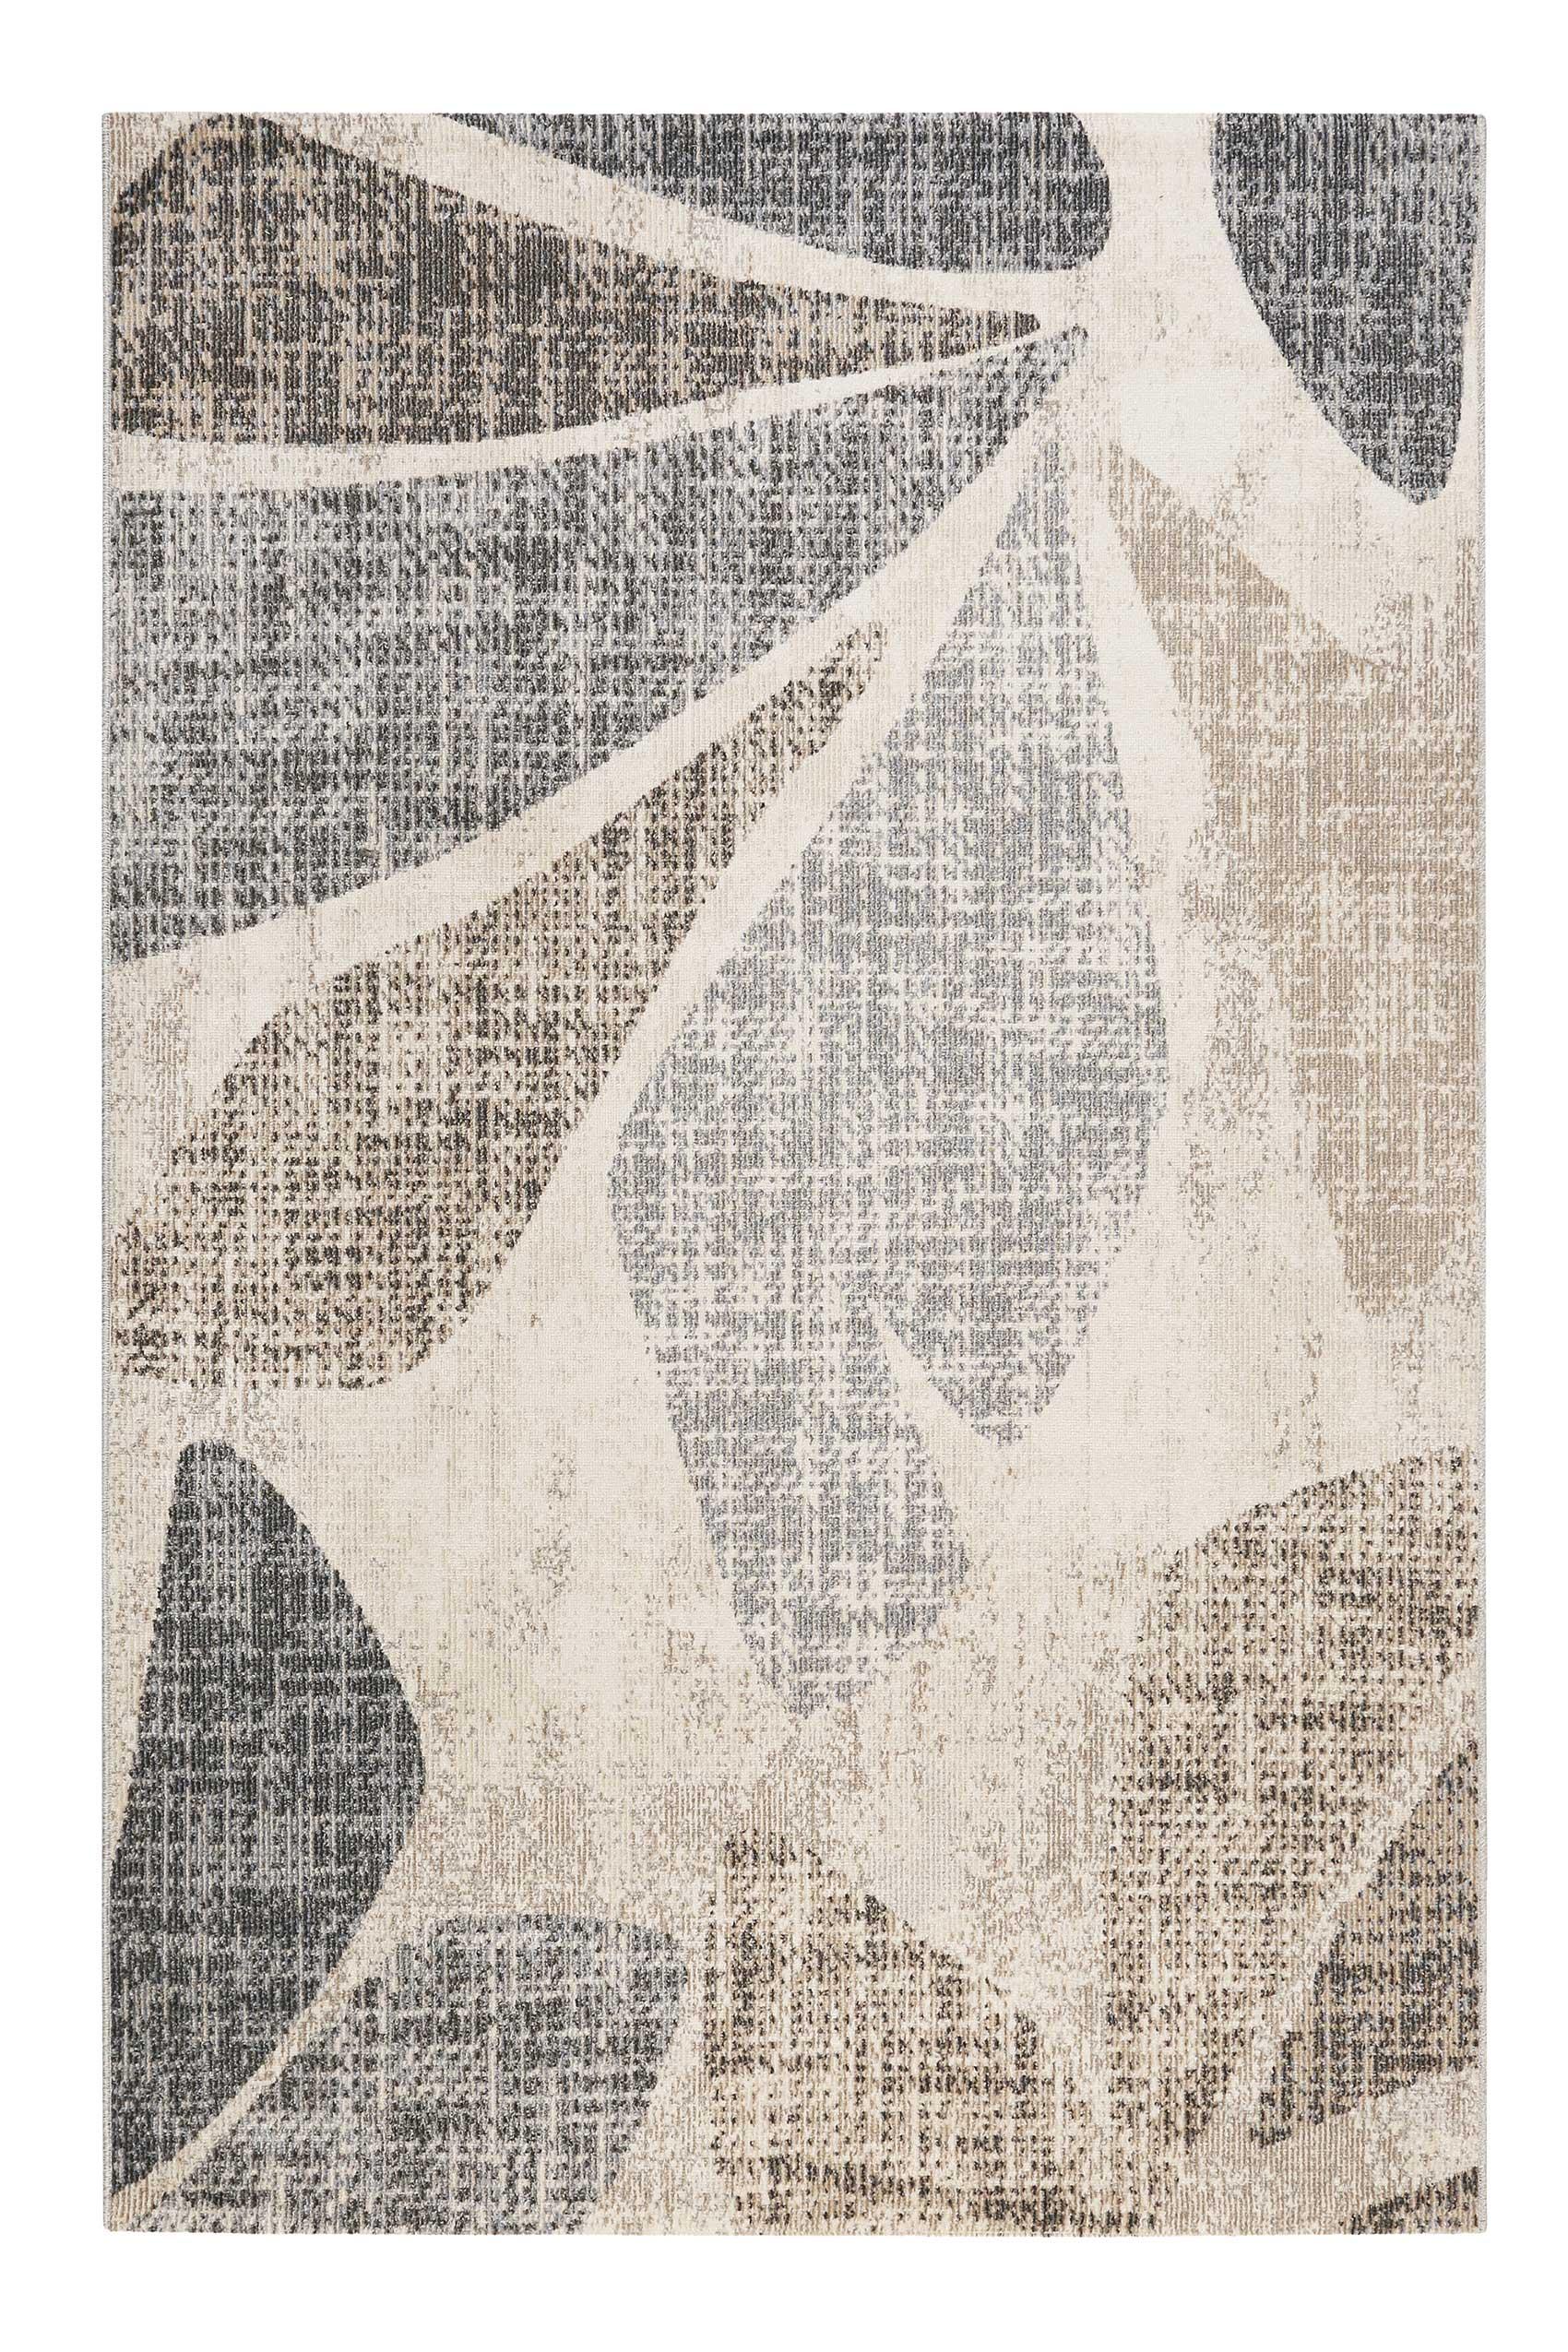 Tapis in/outdoor design inspiration nature gris beige marron 133x200